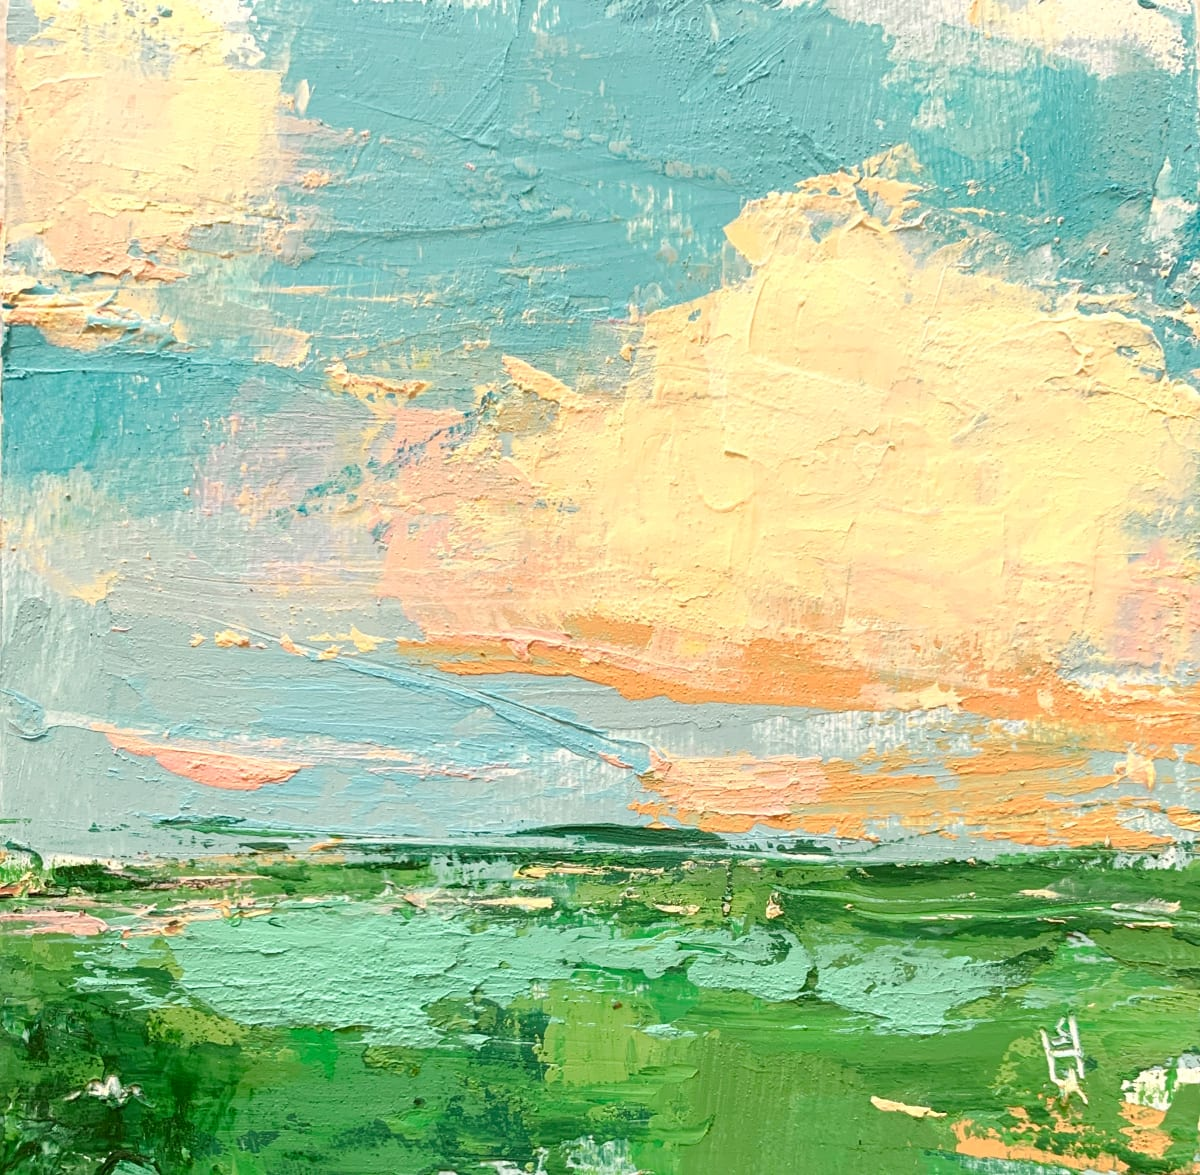 Little Landscape #10 by Sally Hootnick